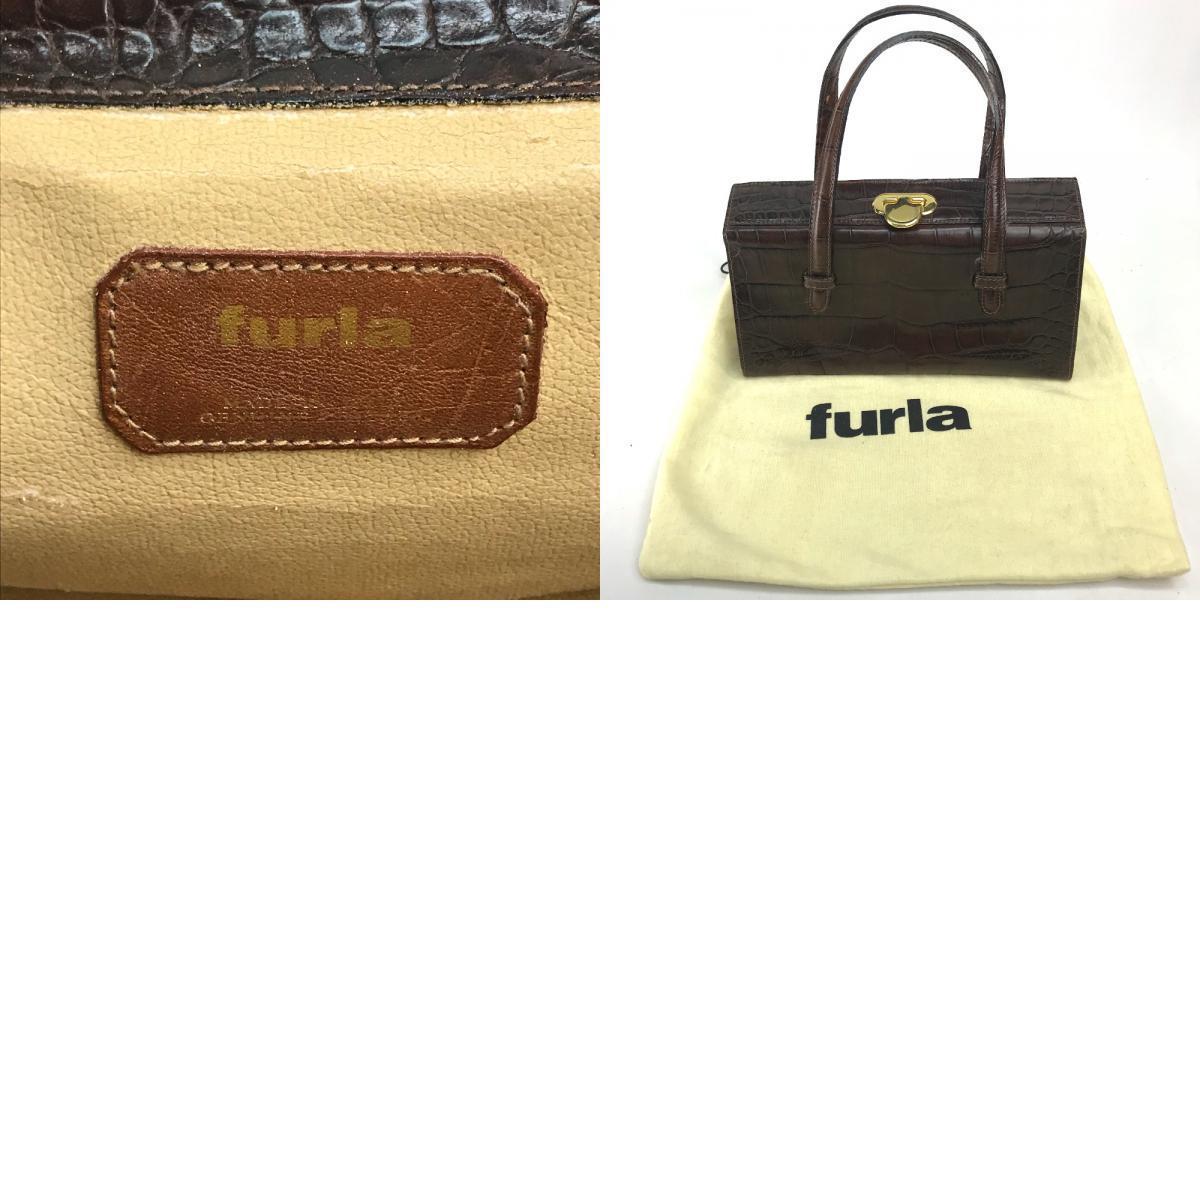 FURLA フルラ クロコ型押しレザー ミニバッグ トートバッグ ハンドバッグ レディース ブラウン/ゴールド金具_画像9